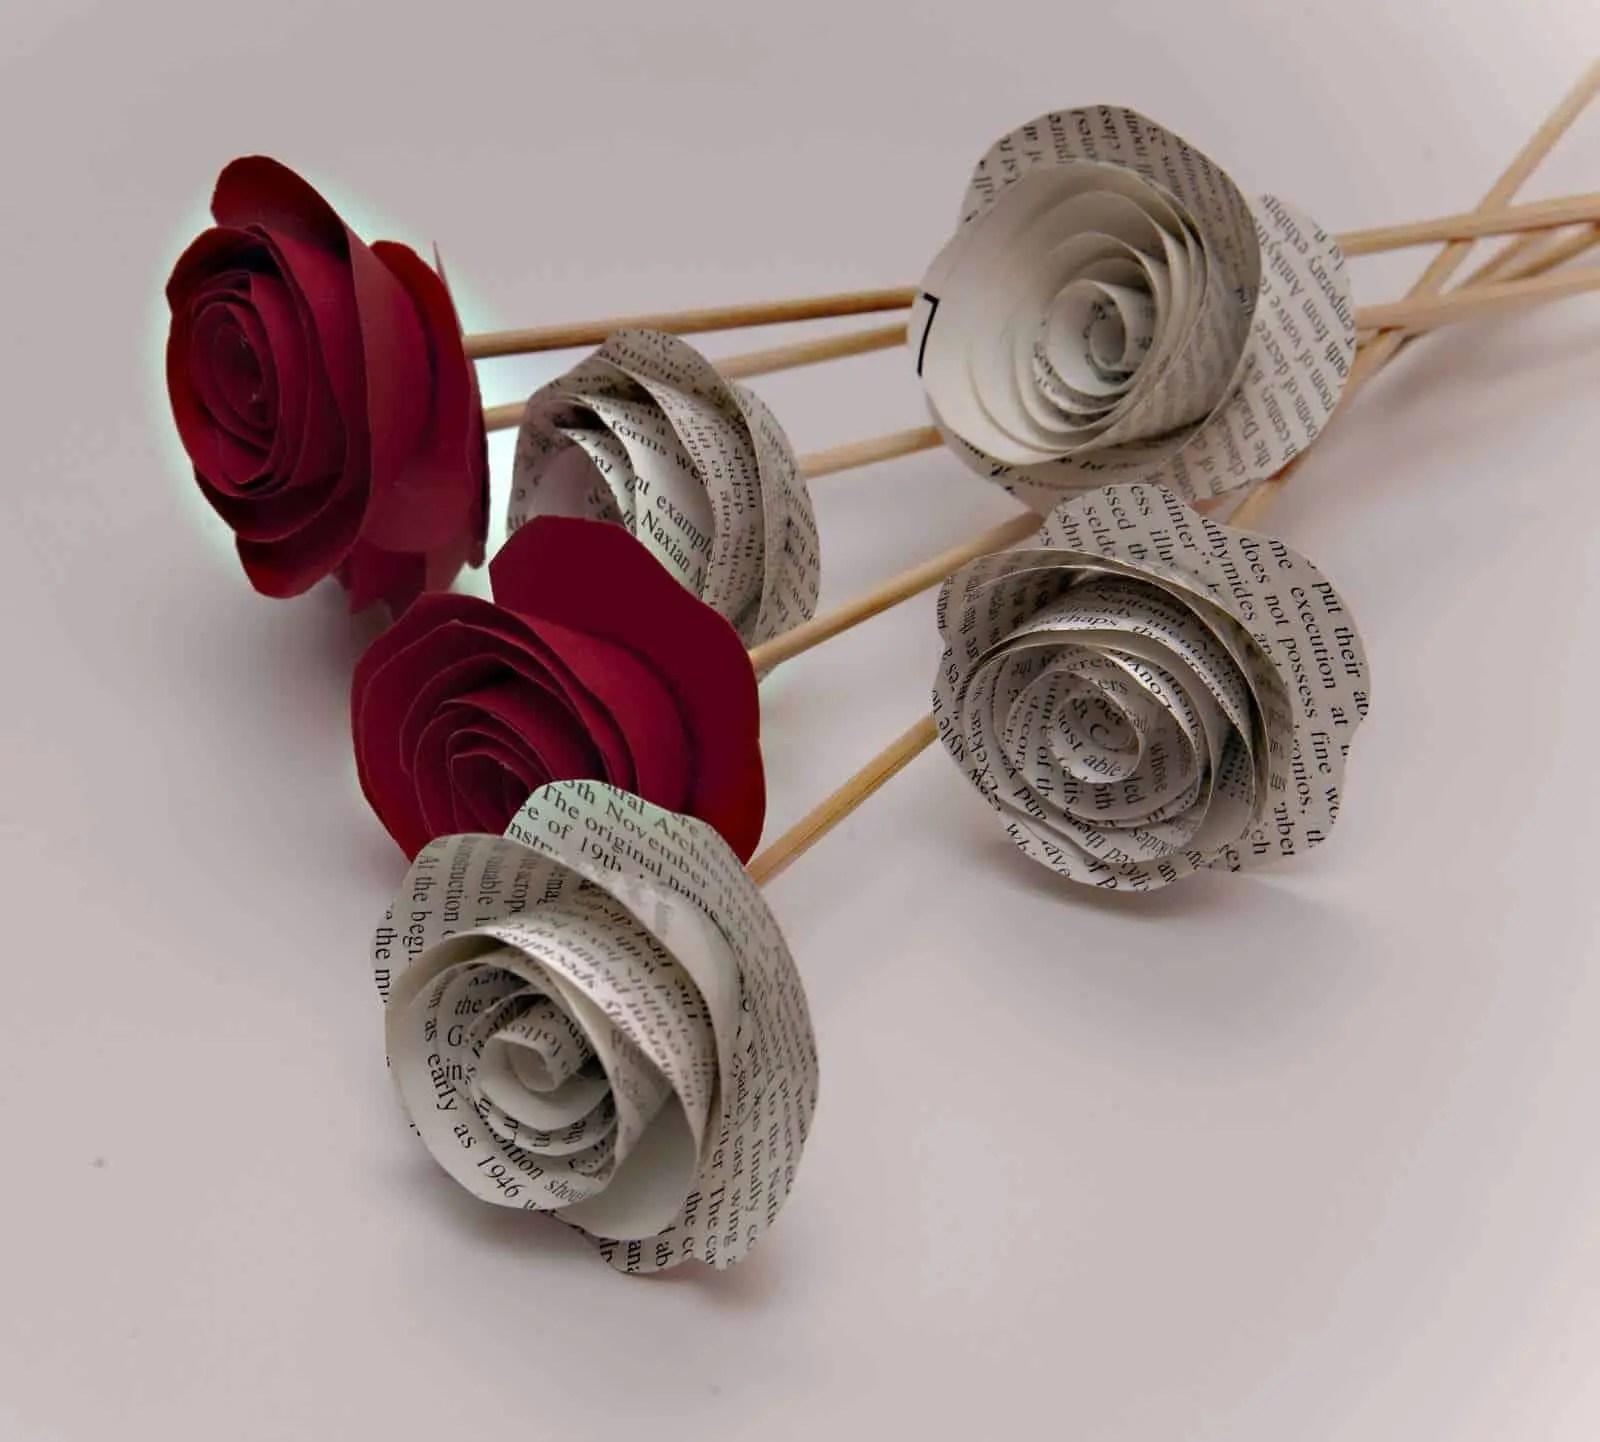 Cmo hacer flores con papel o cartulina